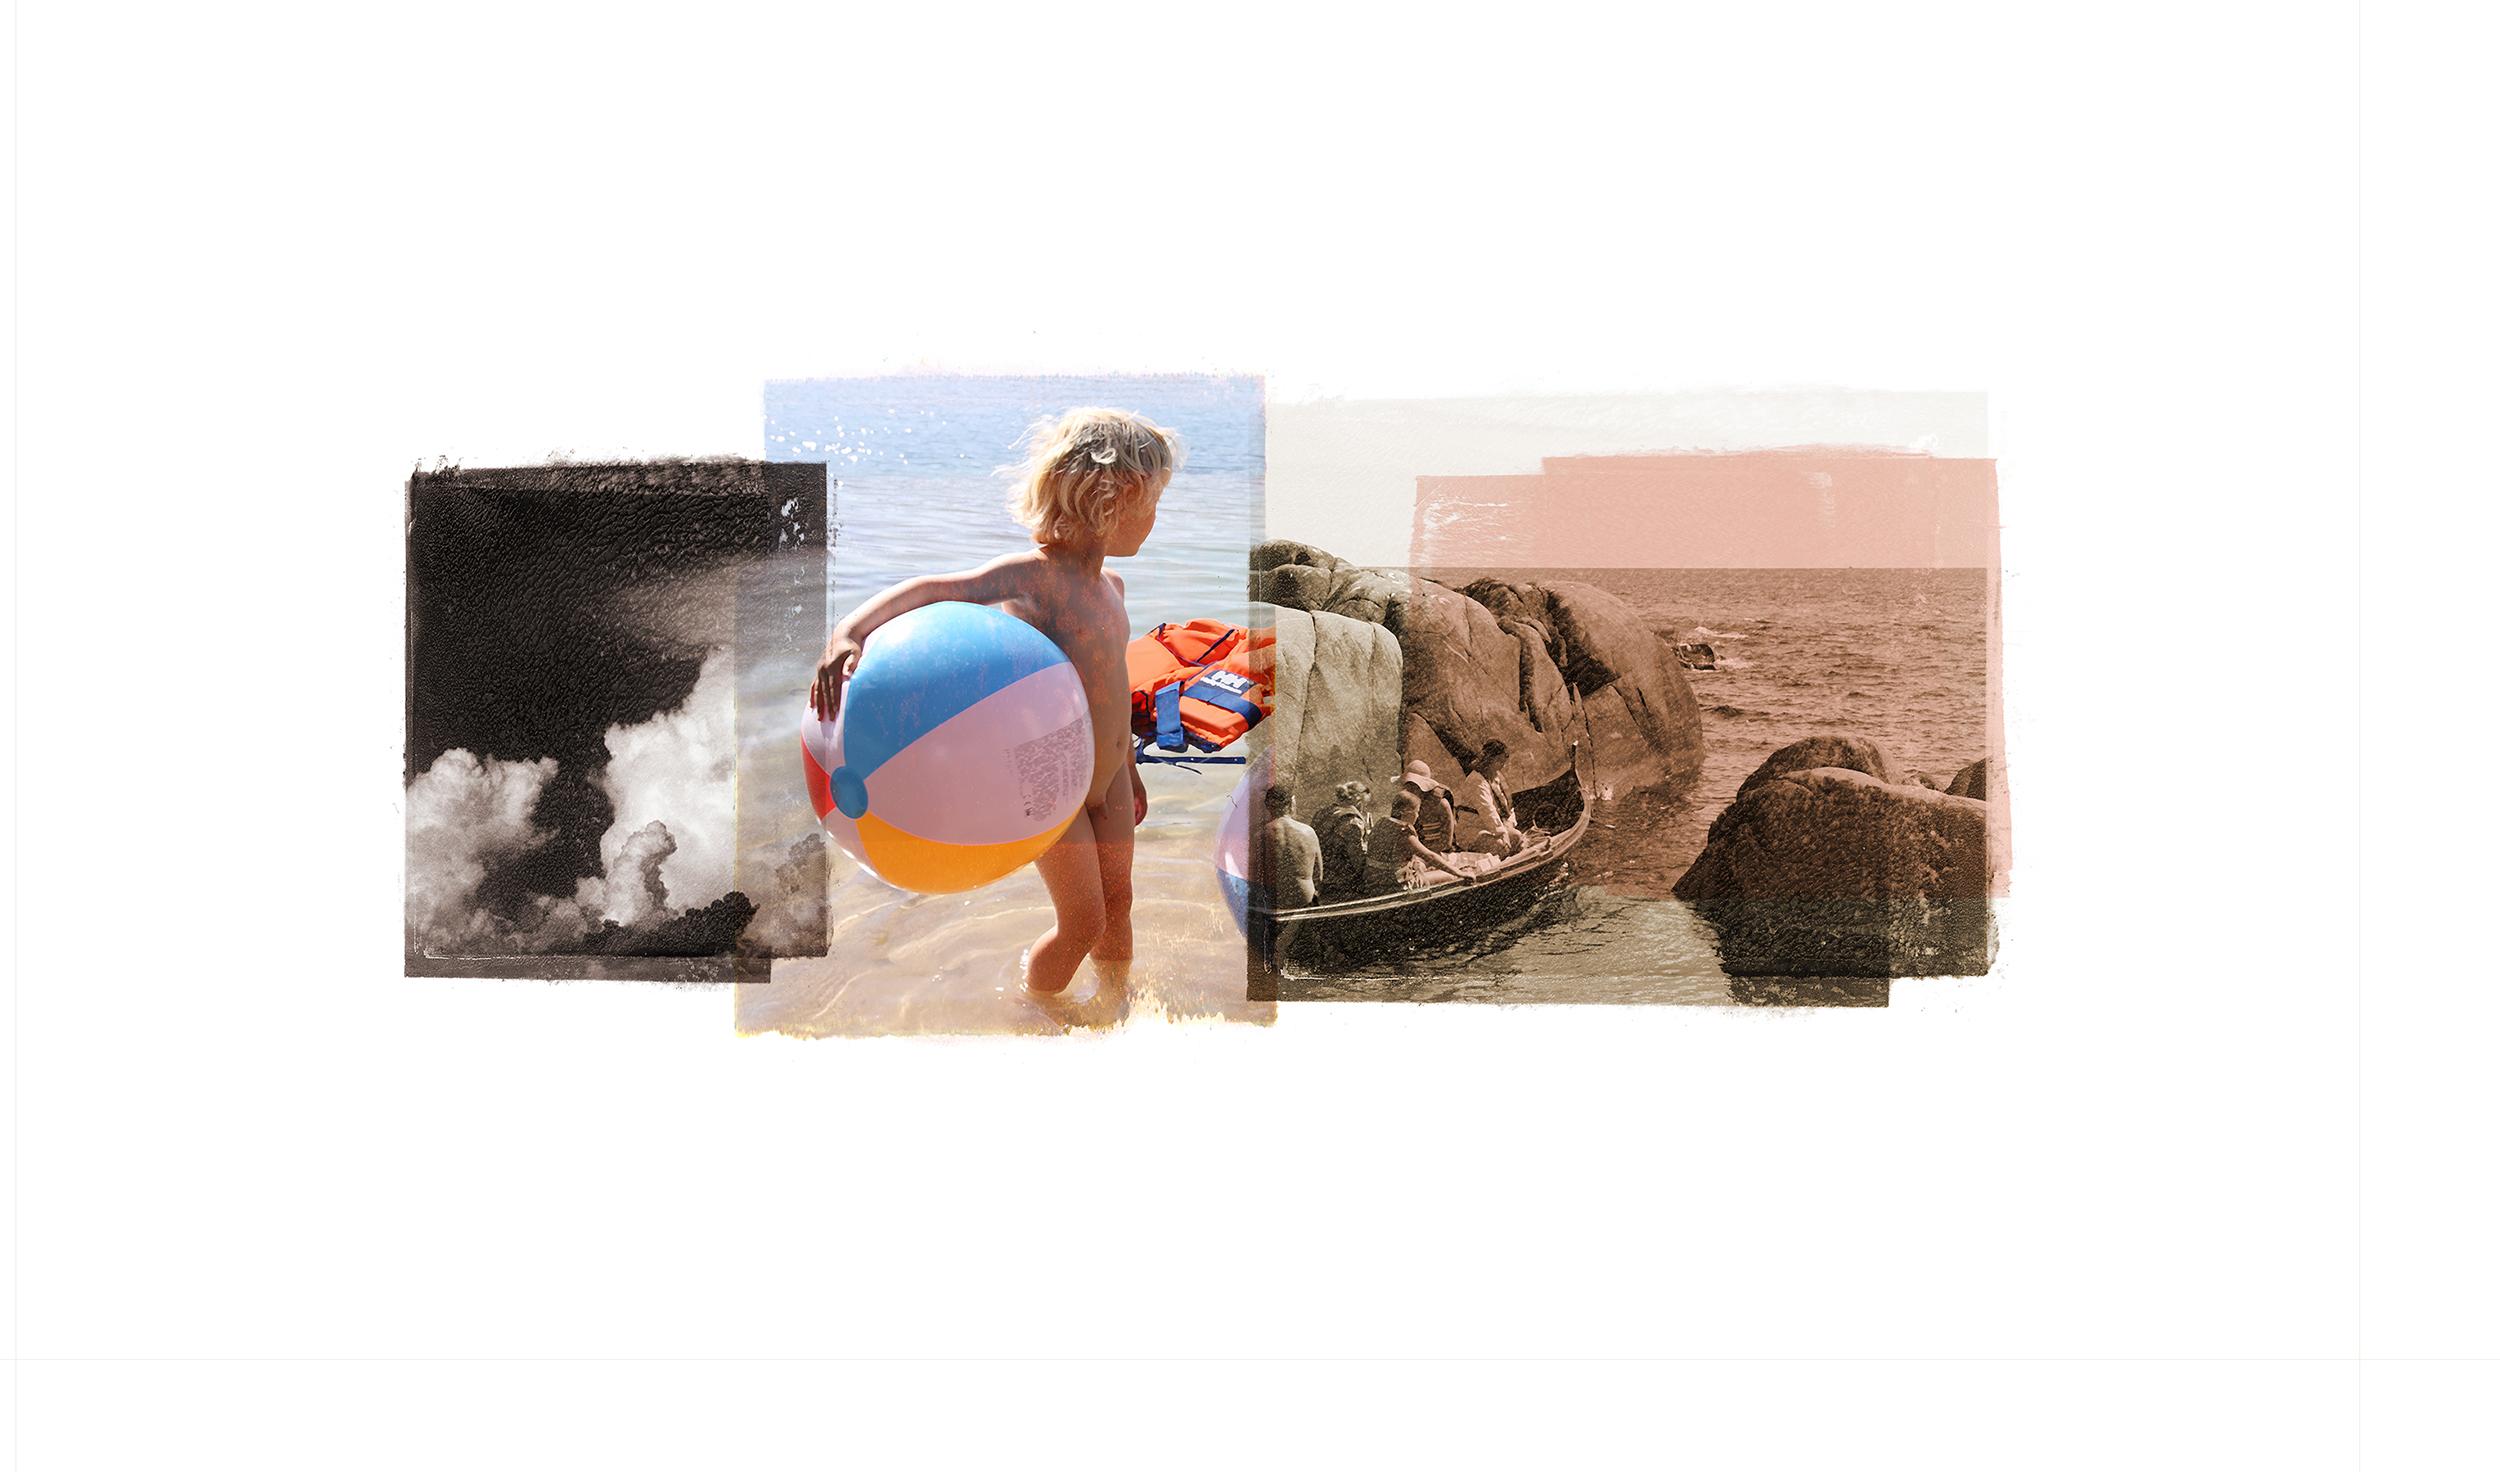 Buoyancy / Horizon (Archipelago)  Original Archival UV Pigment Print / BFK Rives 250 gr 20 x 10 cm / 7,8 x 4 in Edition of 90 + 15 Ap Editeur: Per Fronth Studios / Printer Henrik Aunevik Commission: Sparebanken Sør  14/2016: